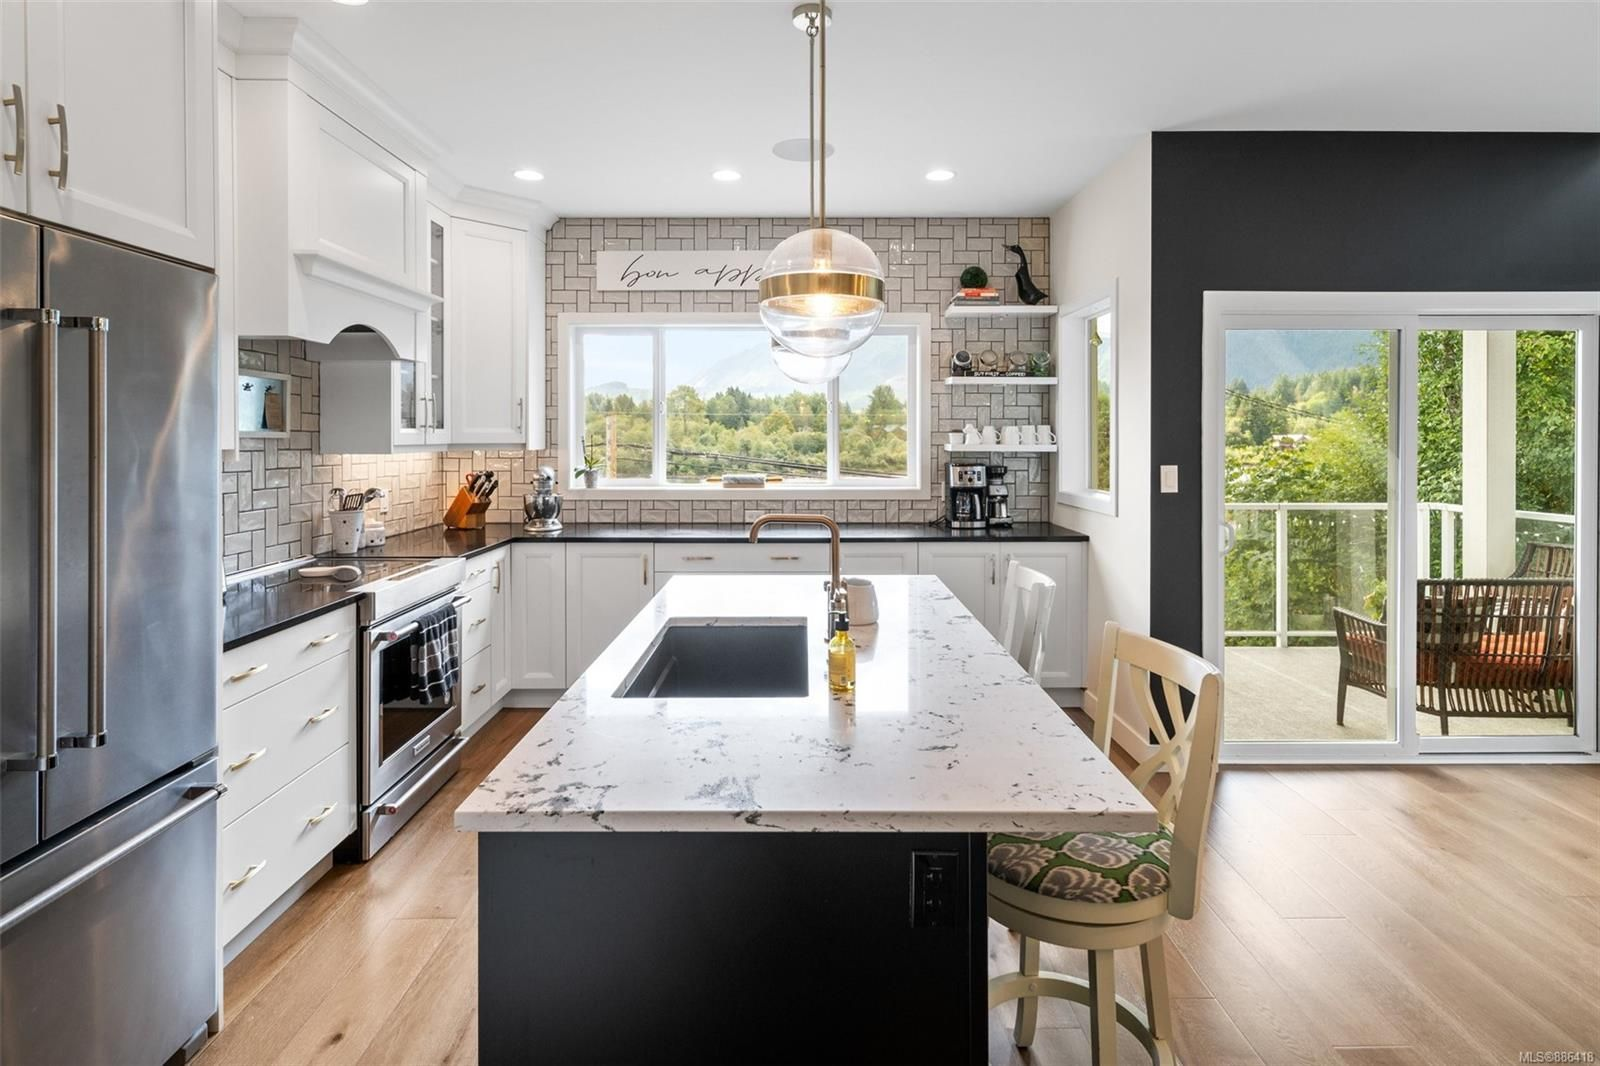 Main Photo: 247 North Shore Rd in : Du Lake Cowichan Half Duplex for sale (Duncan)  : MLS®# 886418